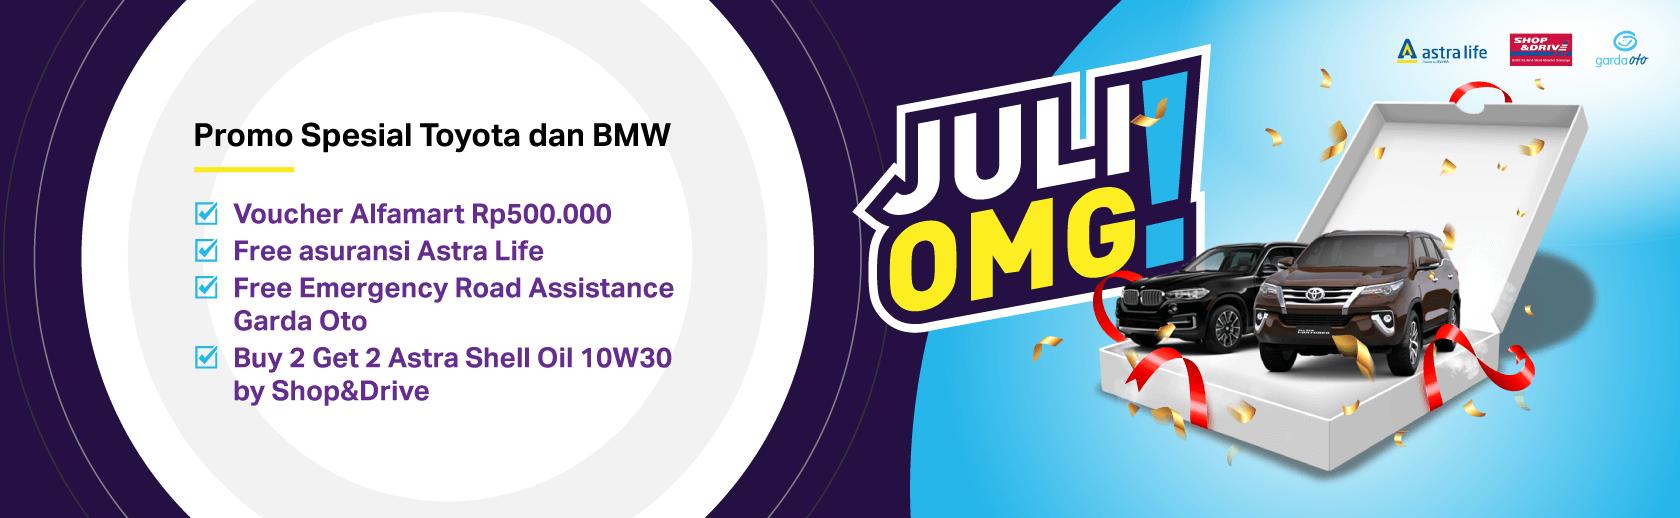 JULI OMG ! PROMO SPESIAL TOYOTA DAN BMW